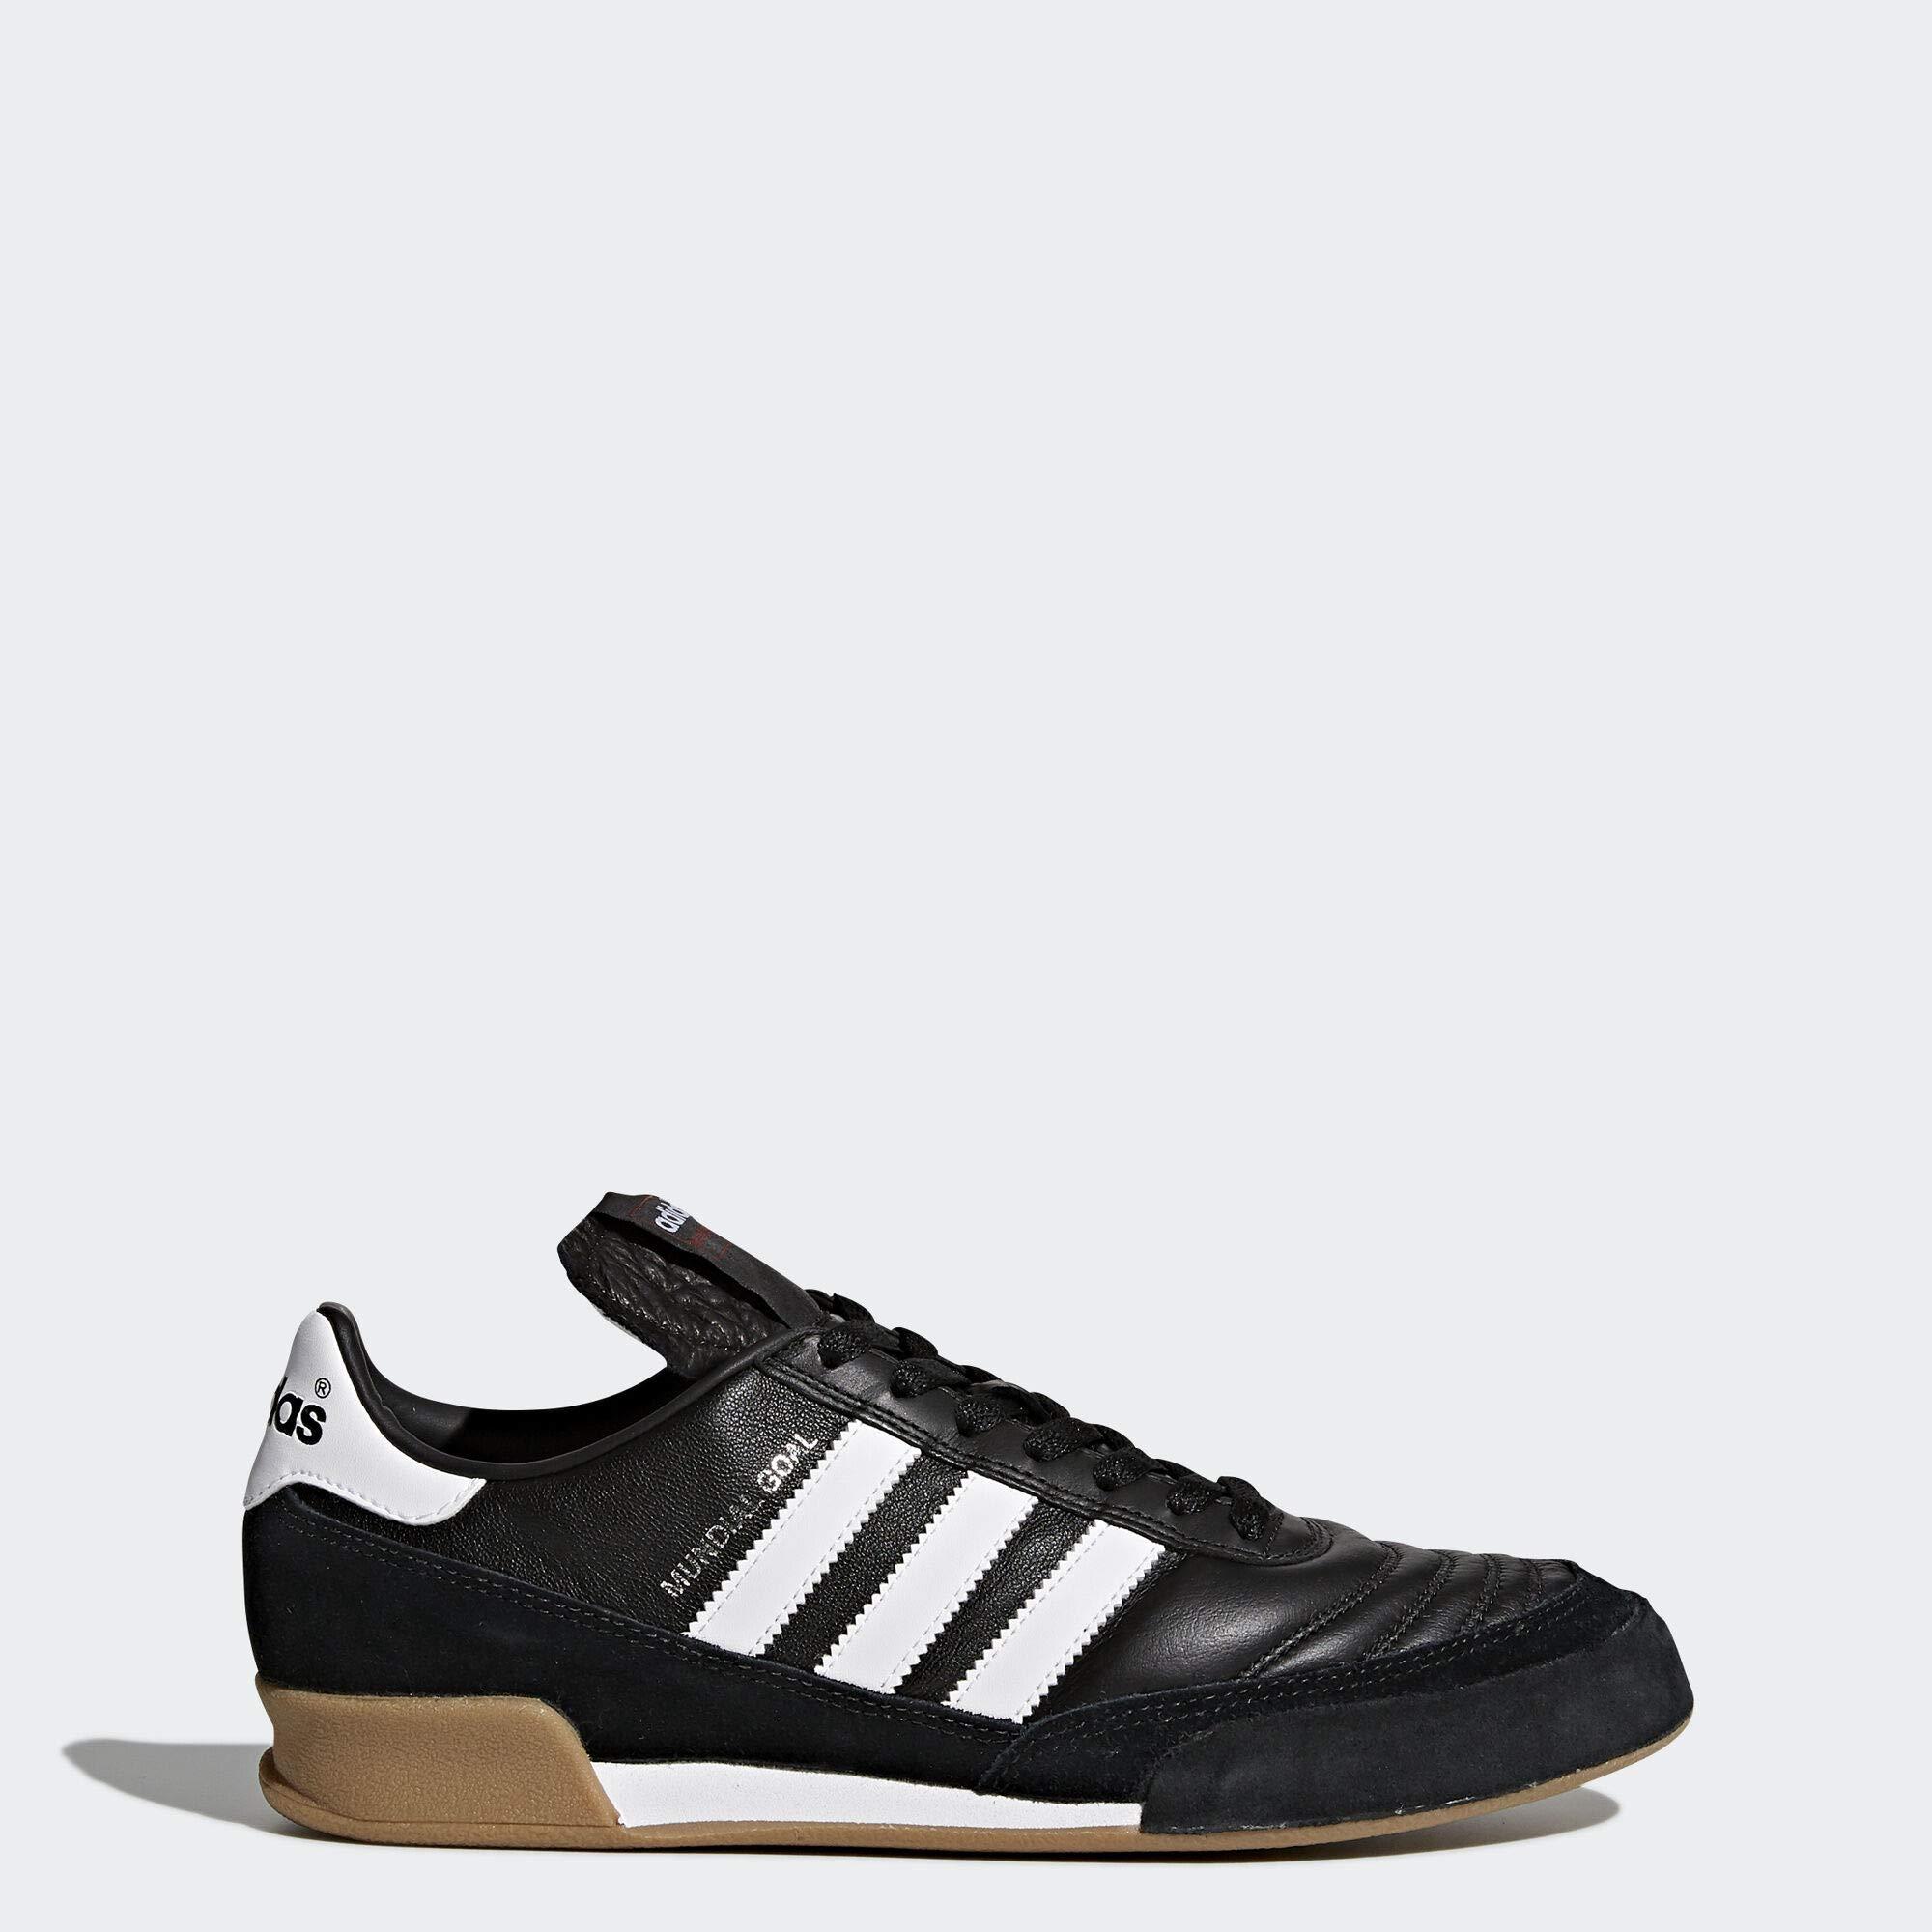 adidas Men's Mundial Goal Soccer Shoe, Black White, 10 M US by adidas